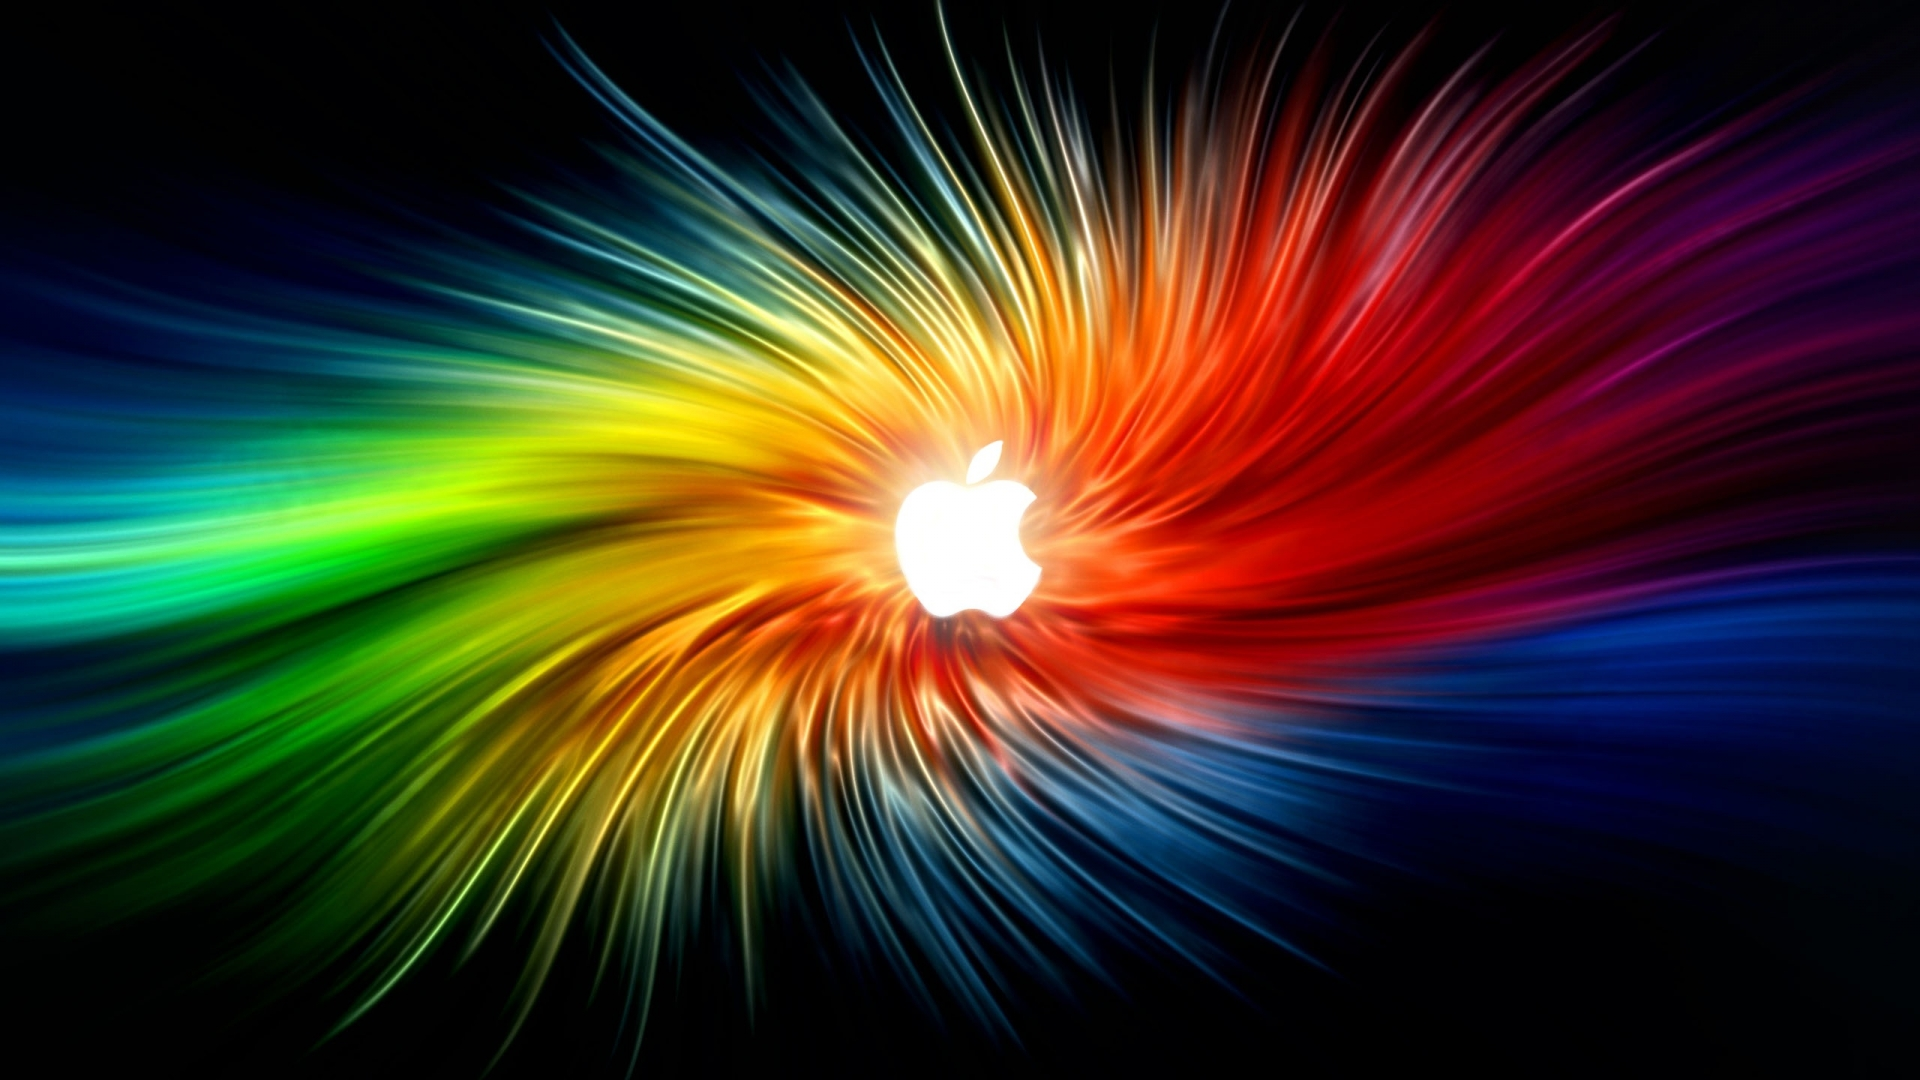 http://3.bp.blogspot.com/-wTLoguWw-bQ/UE9zN93UefI/AAAAAAAAJbI/Q1Vcom_ZnP0/s0/apple-swirl-1920x1080-wallpaper.jpg